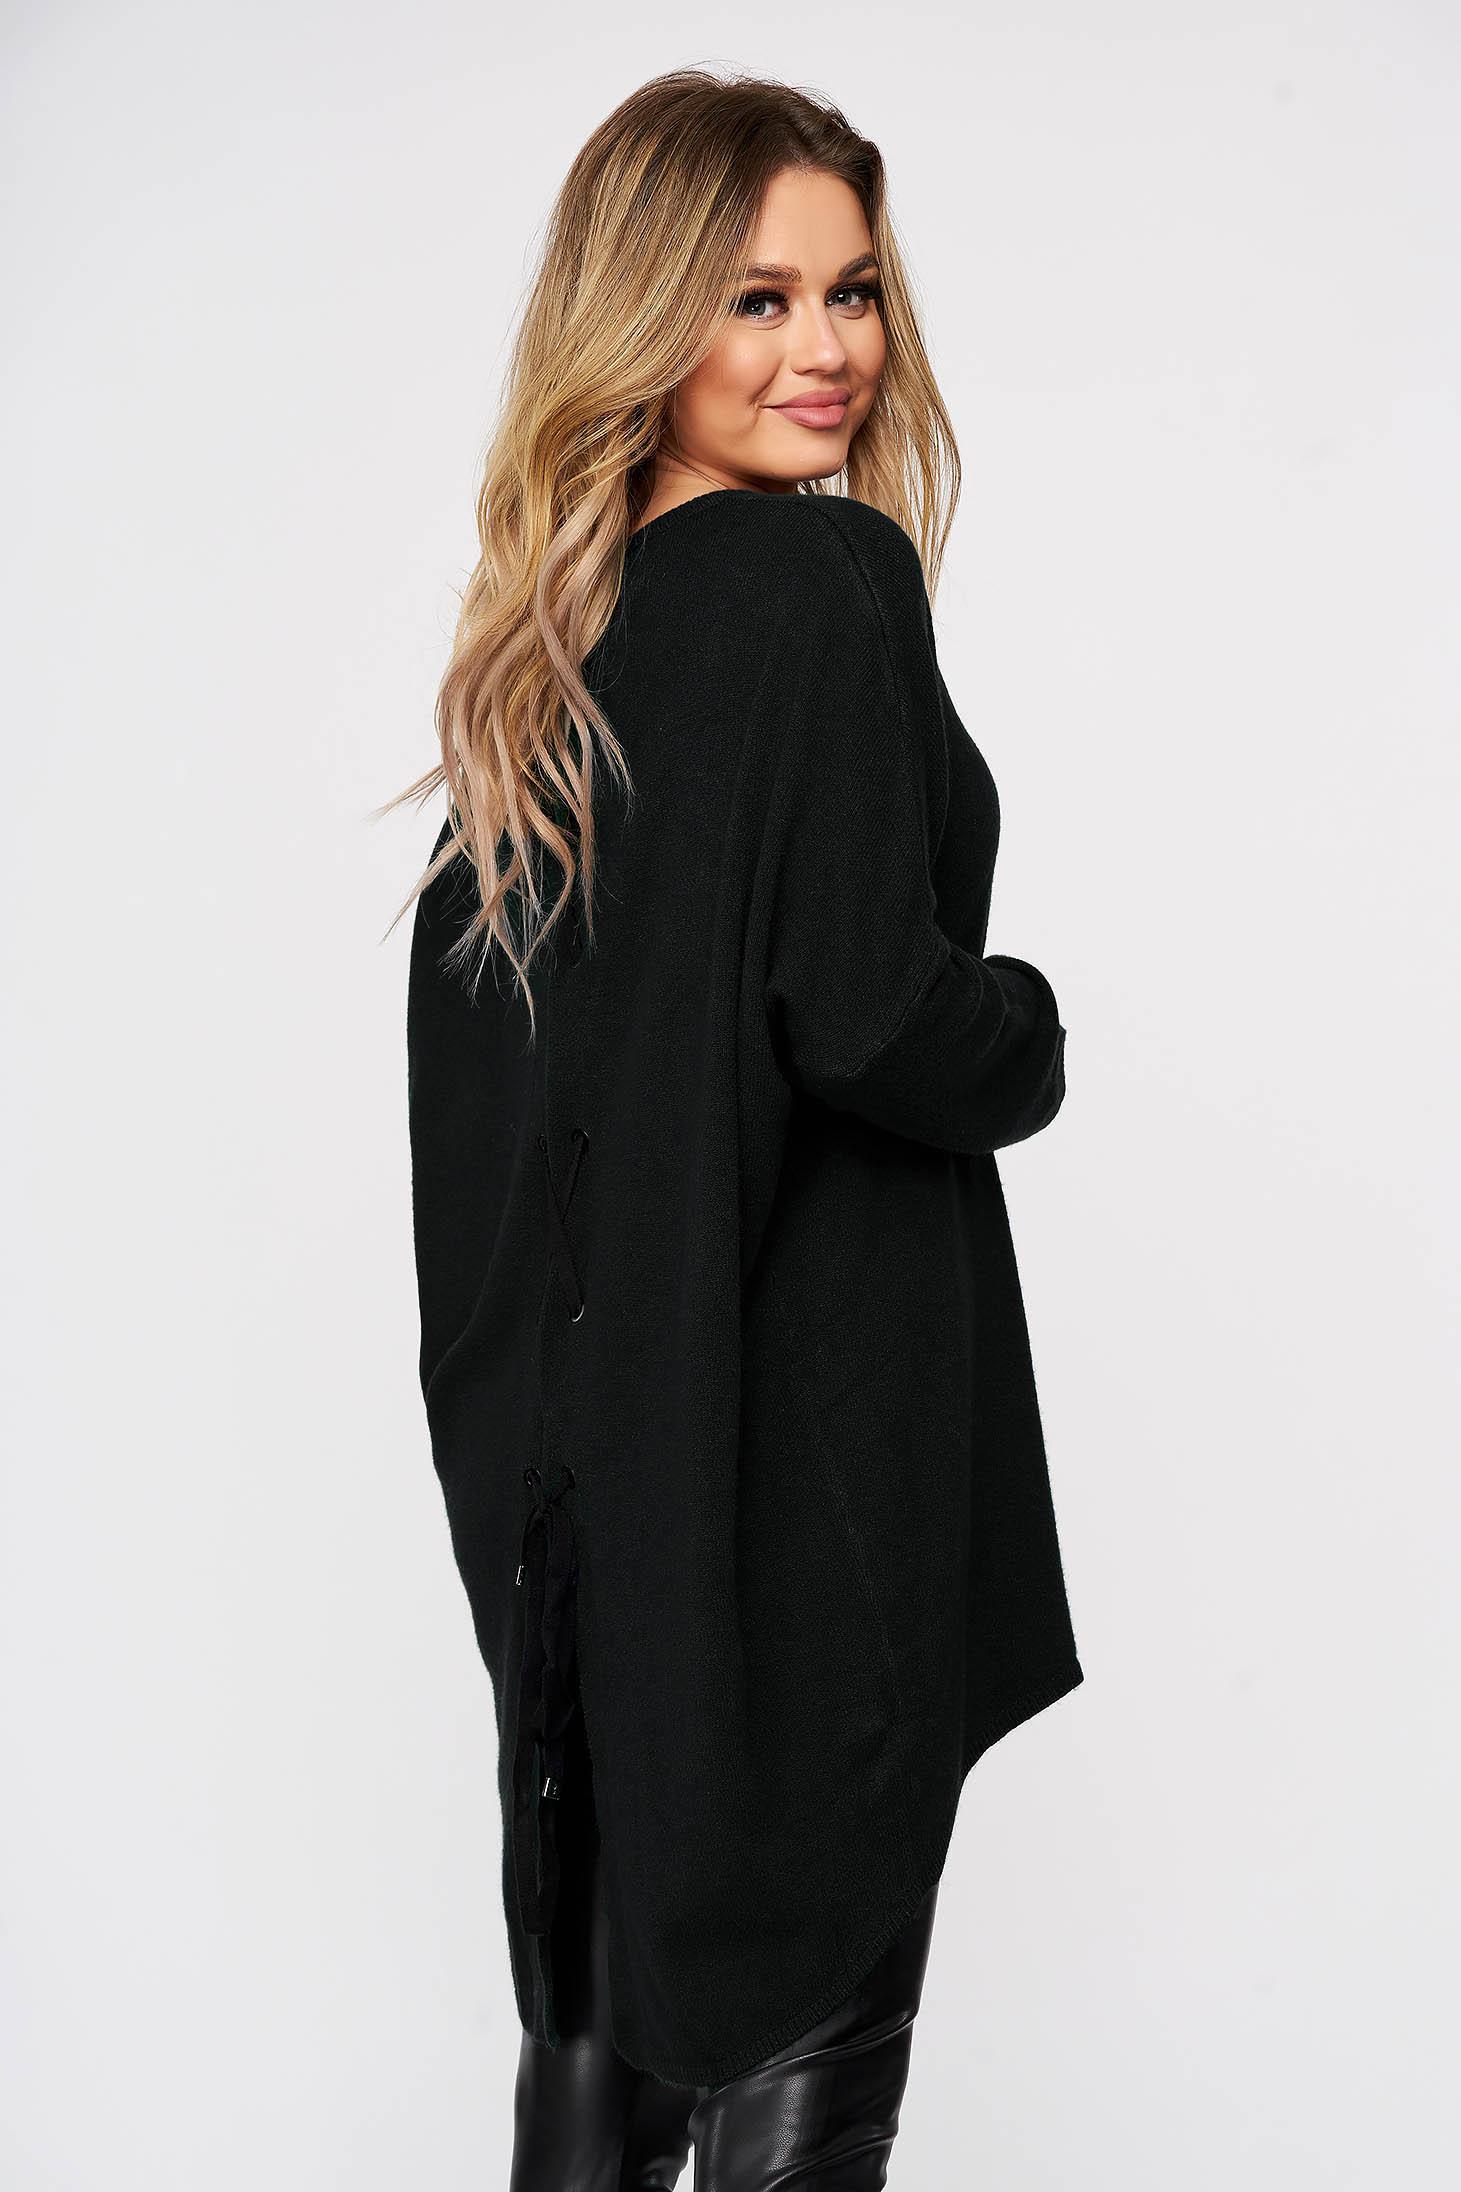 Bluza dama SunShine neagra tricotata din material elastic si fin cu croi larg cu snur si slit la spate